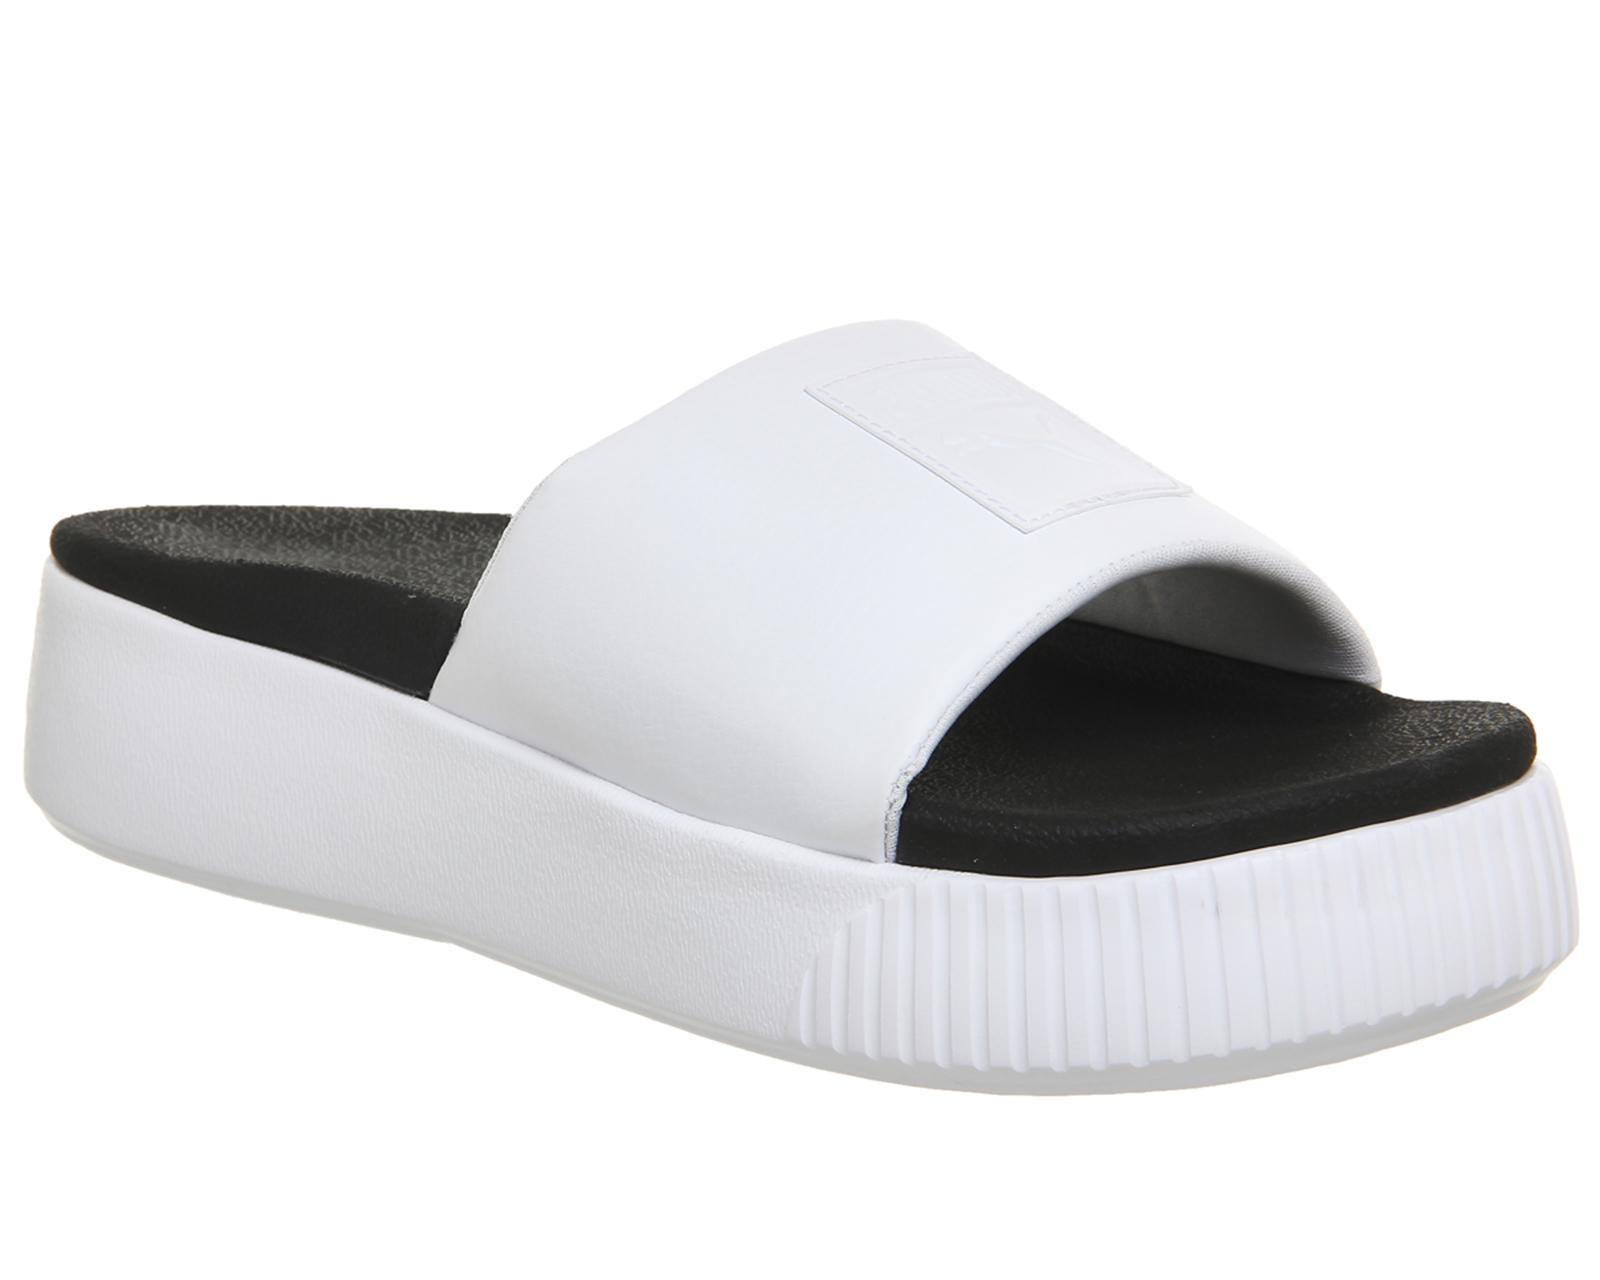 a3c6226c7204 Sentinel Womens Puma Platform Slides Puma White Puma Black Sandals